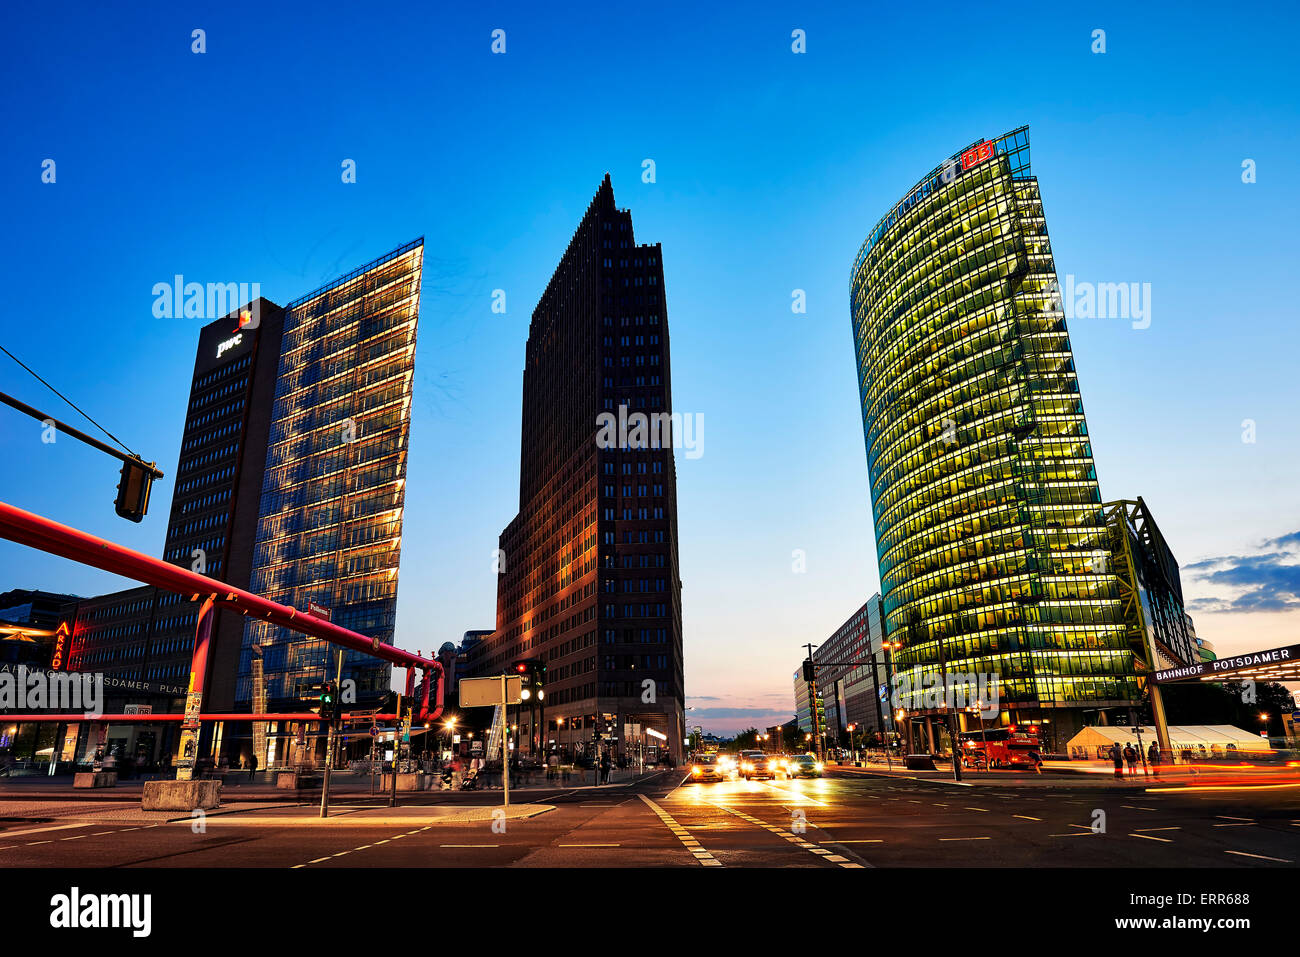 Germany, Berlin, Mitte district, Potsdamerplatz. - Stock Image